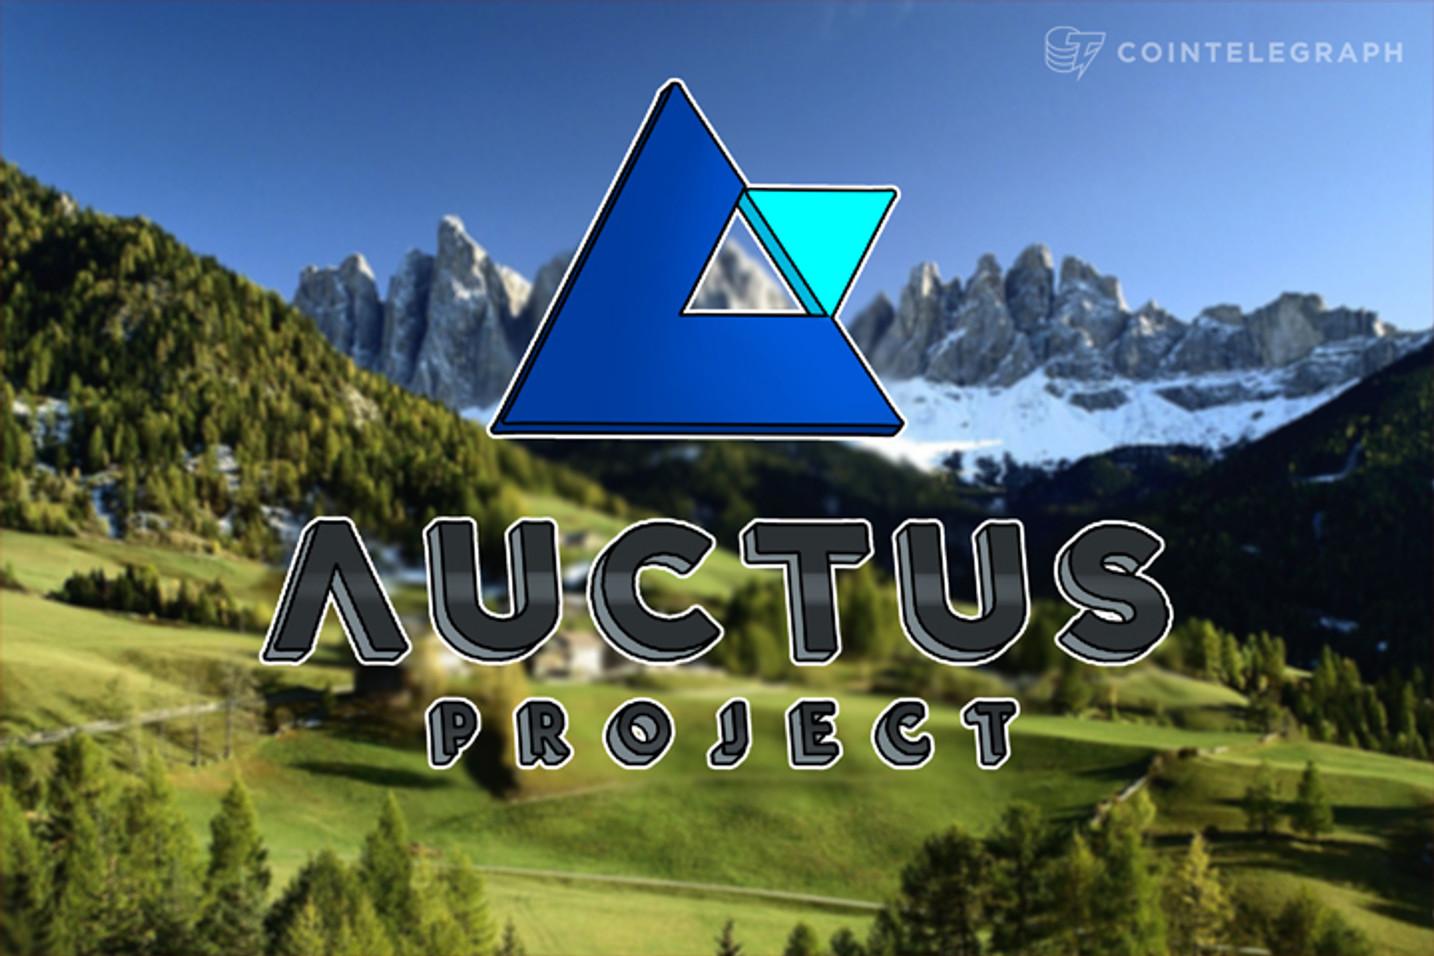 Auctus Pension Project - Pre-Sale Whitelist Closing in 24h